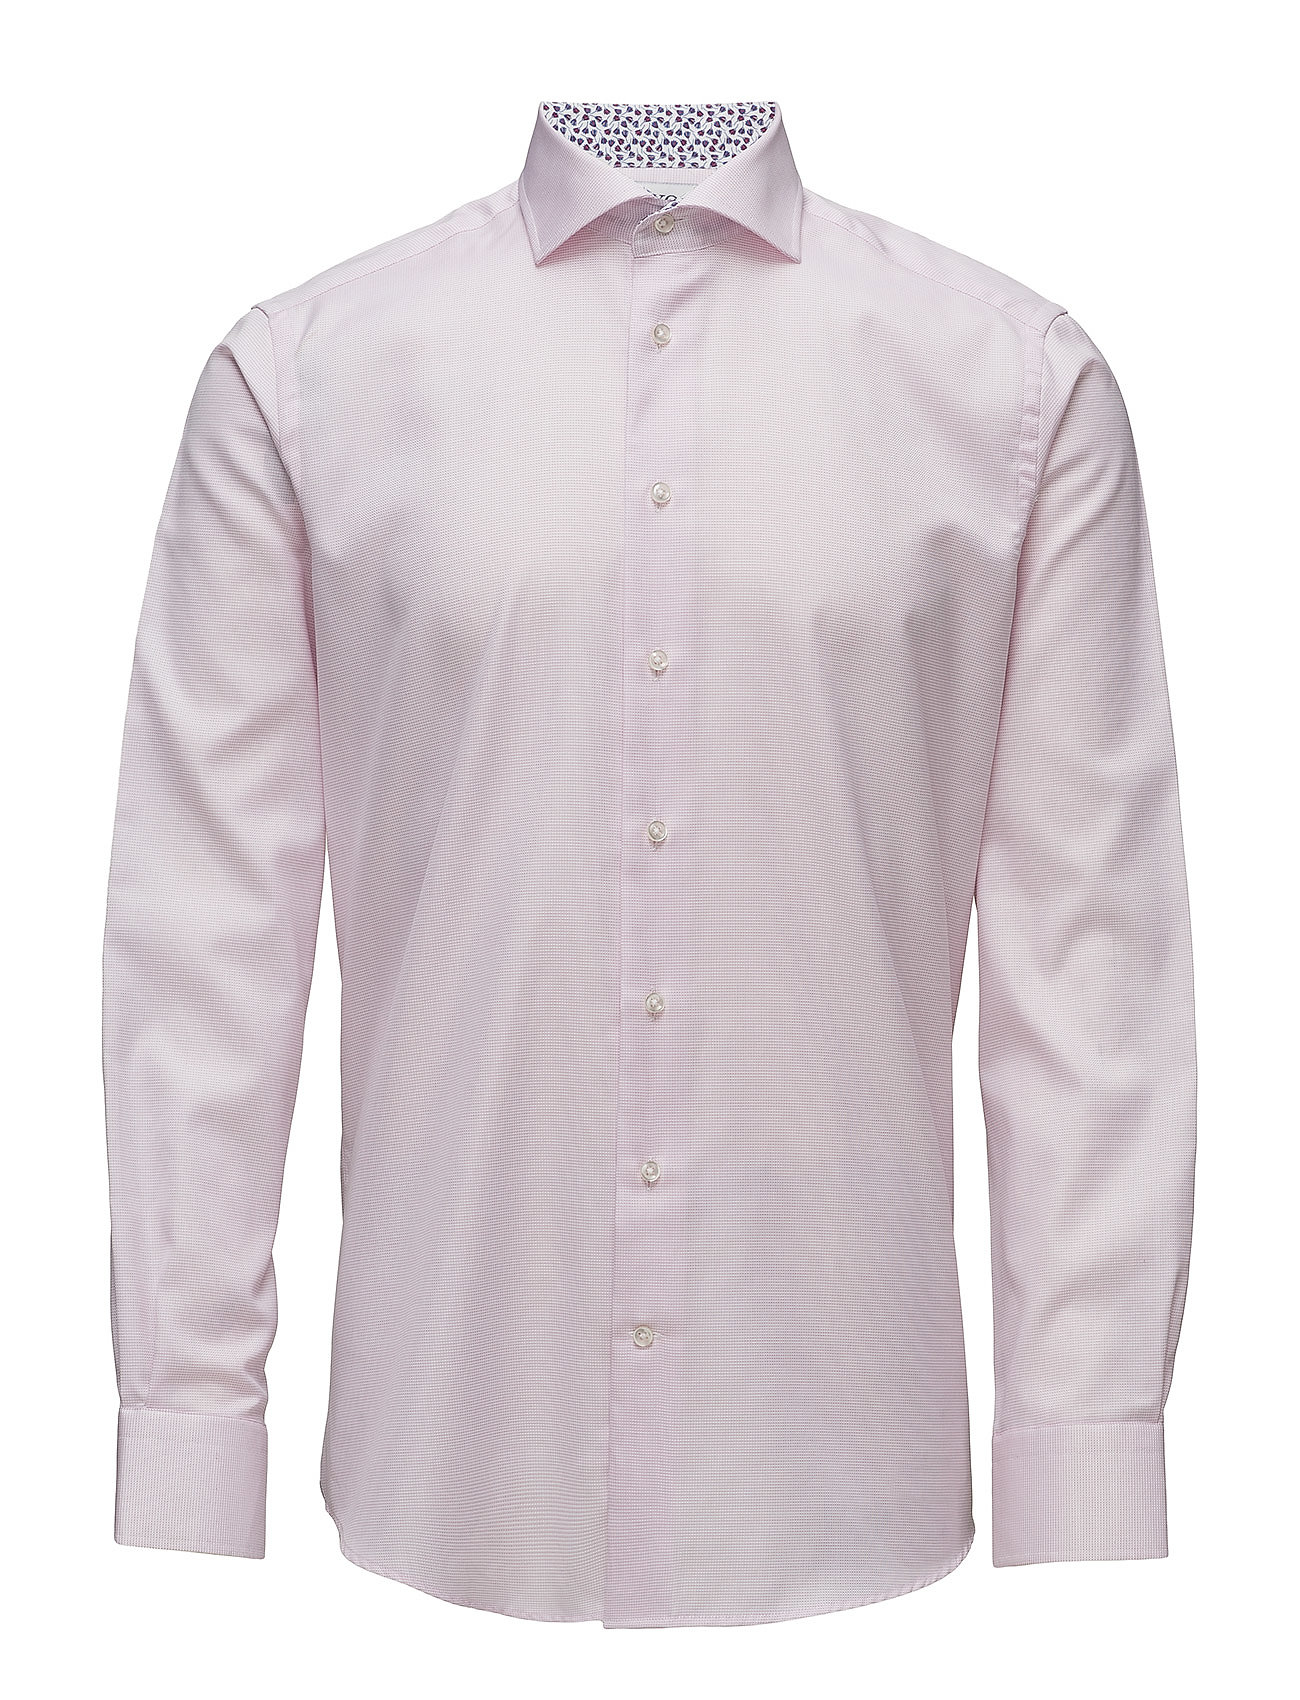 xo shirtmaker – 8660 details - gordon fc på boozt.com dk